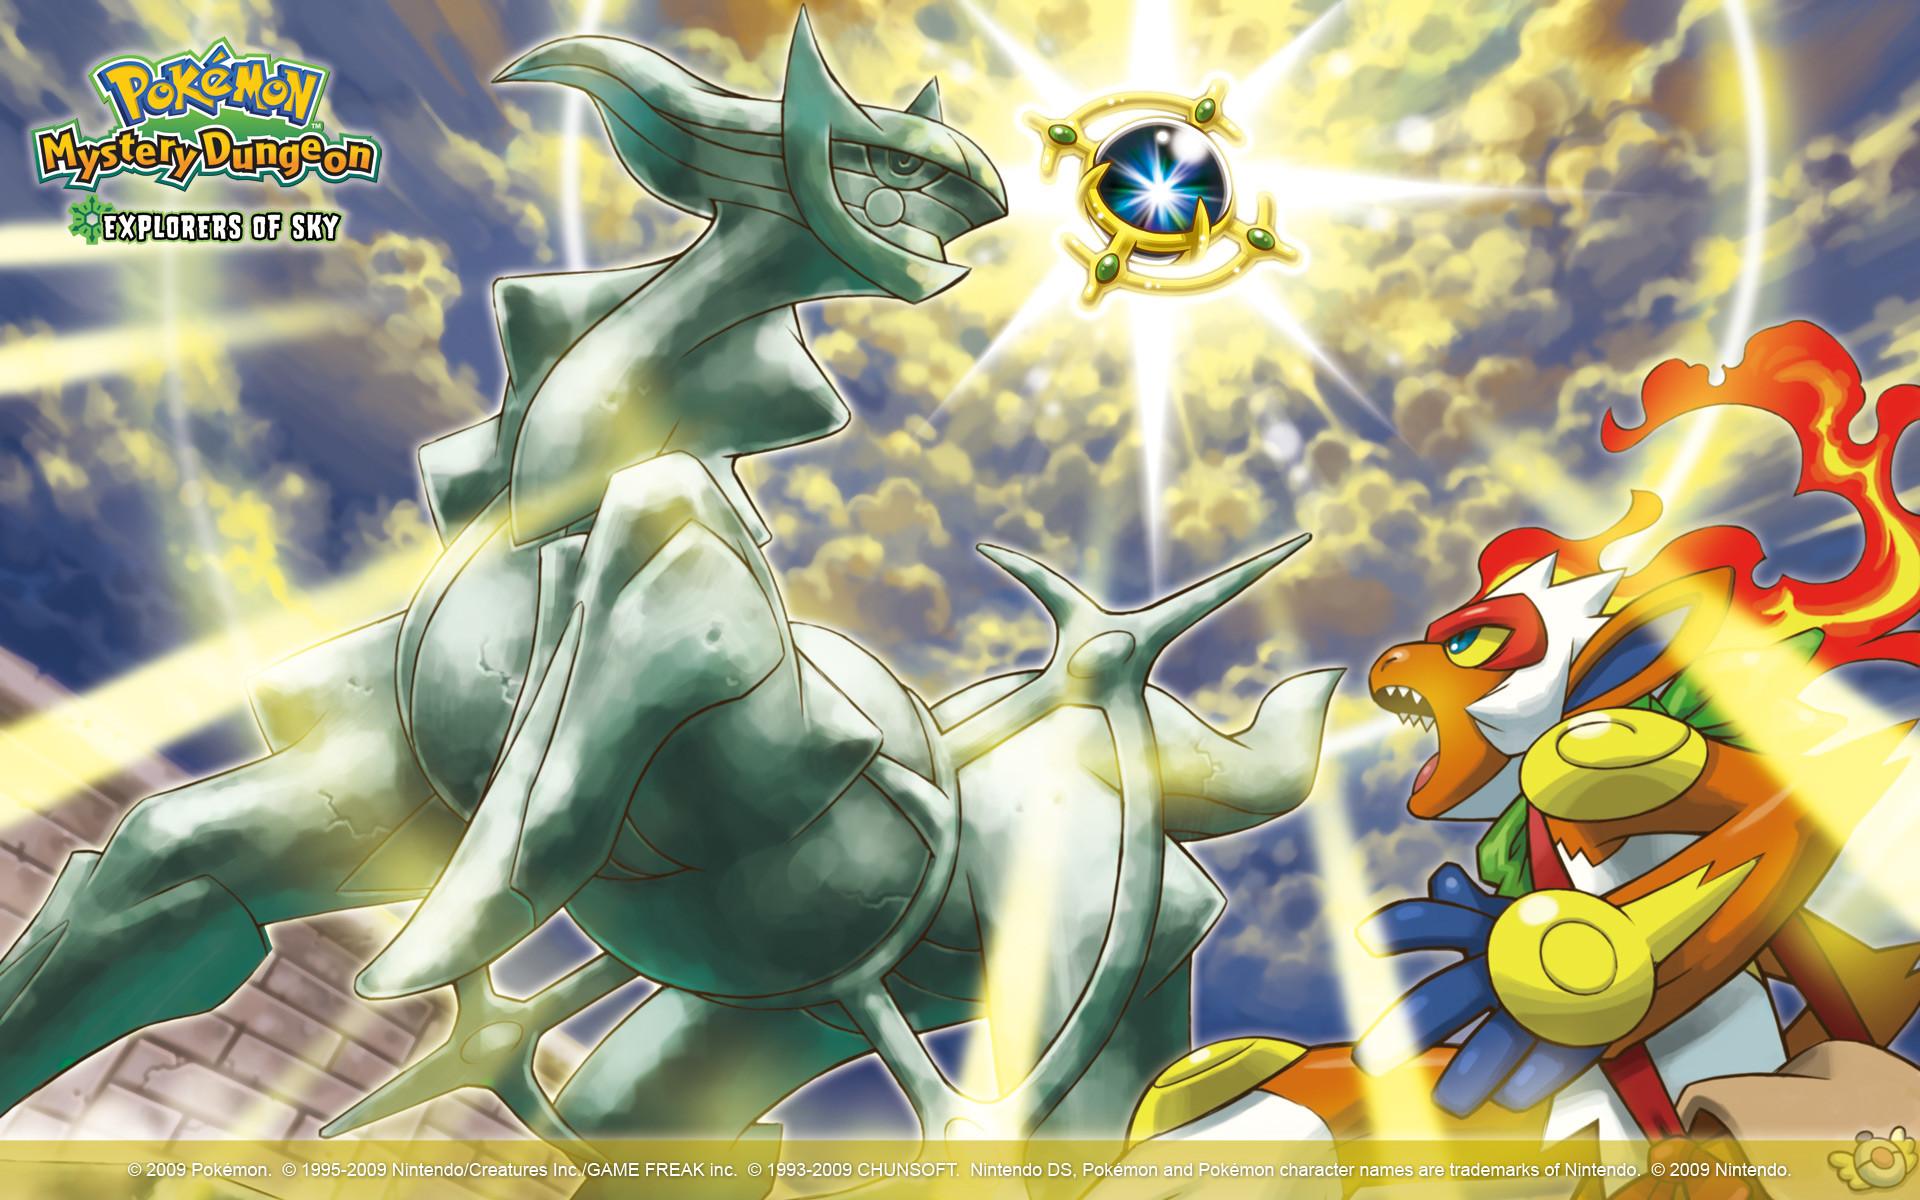 Pokémon Mystery Dungeon: Explorers of Sky Wallpaper 2